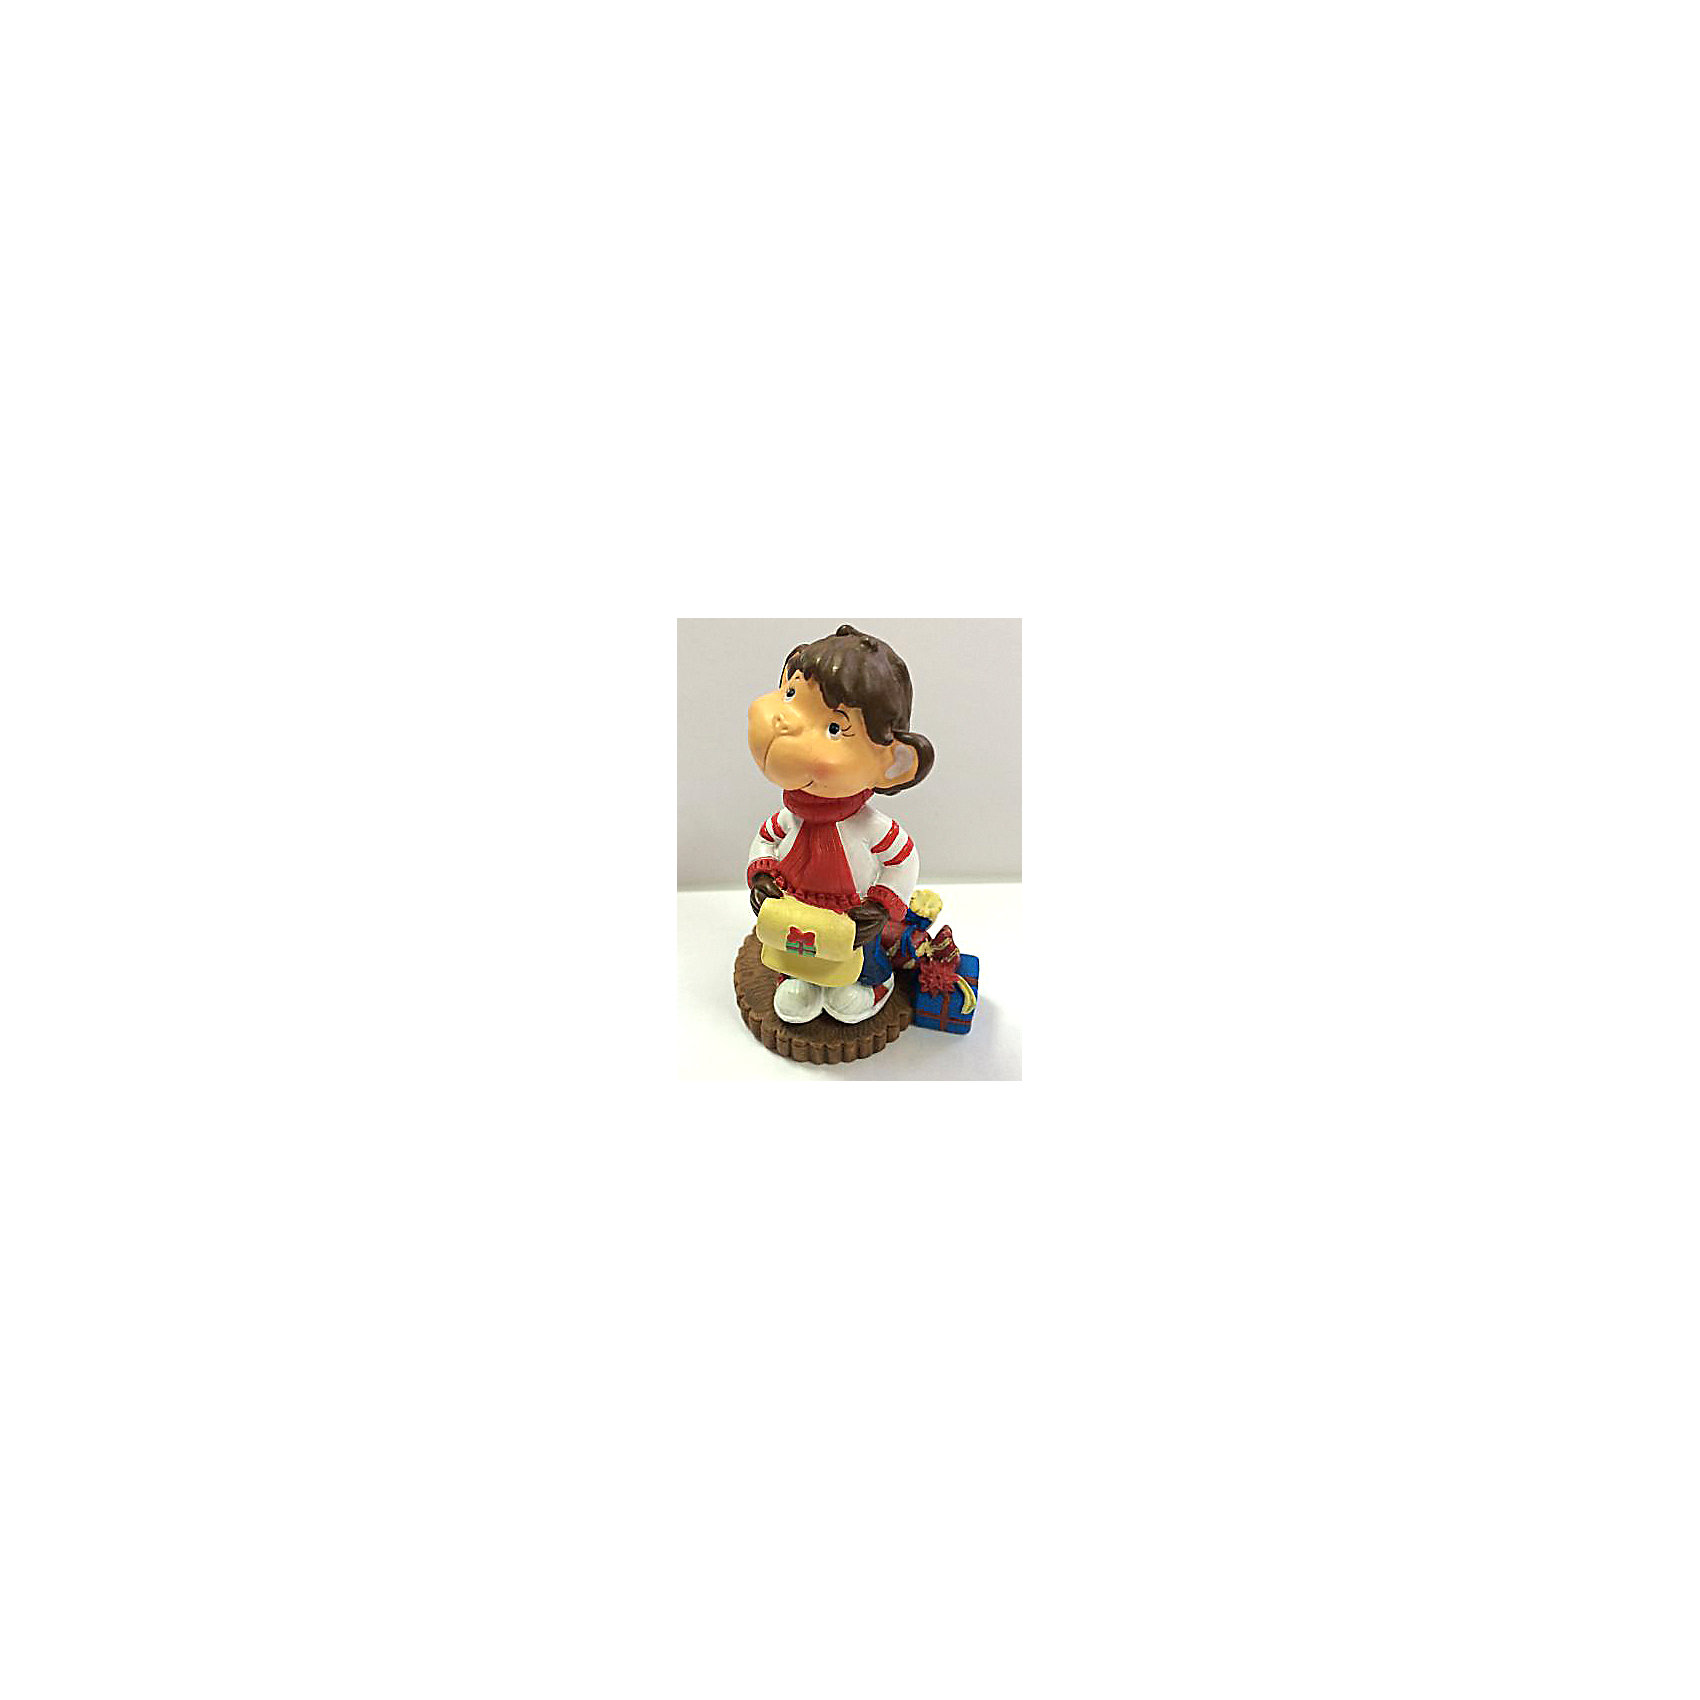 Феникс-Презент Декоративная обезьянка С подарками фигурка декоративная обезьянка с подарками высота 8 см